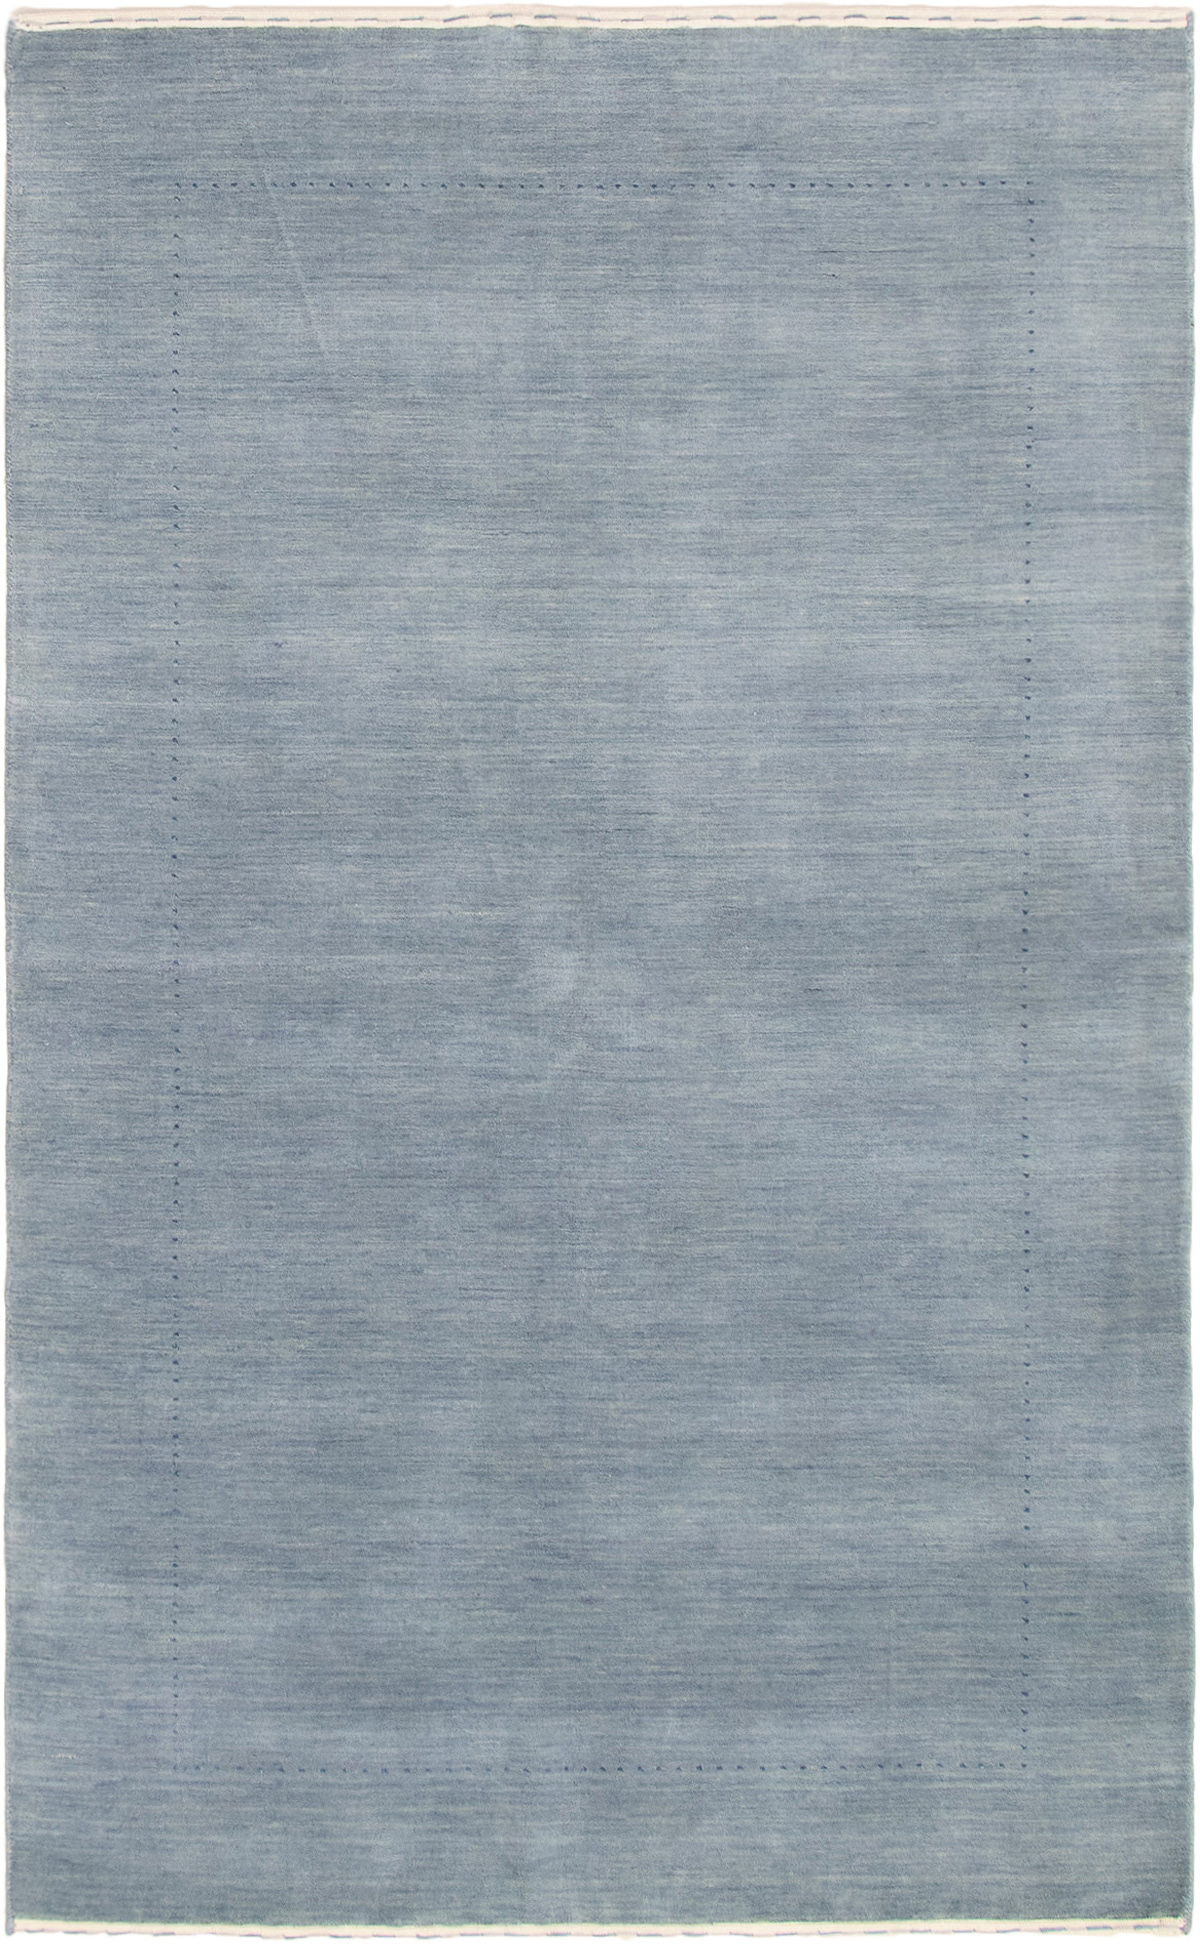 "Hand-knotted Kashkuli Gabbeh Light Denim Blue Wool Rug 4'10"" x 8'1"" Size: 4'10"" x 8'1"""